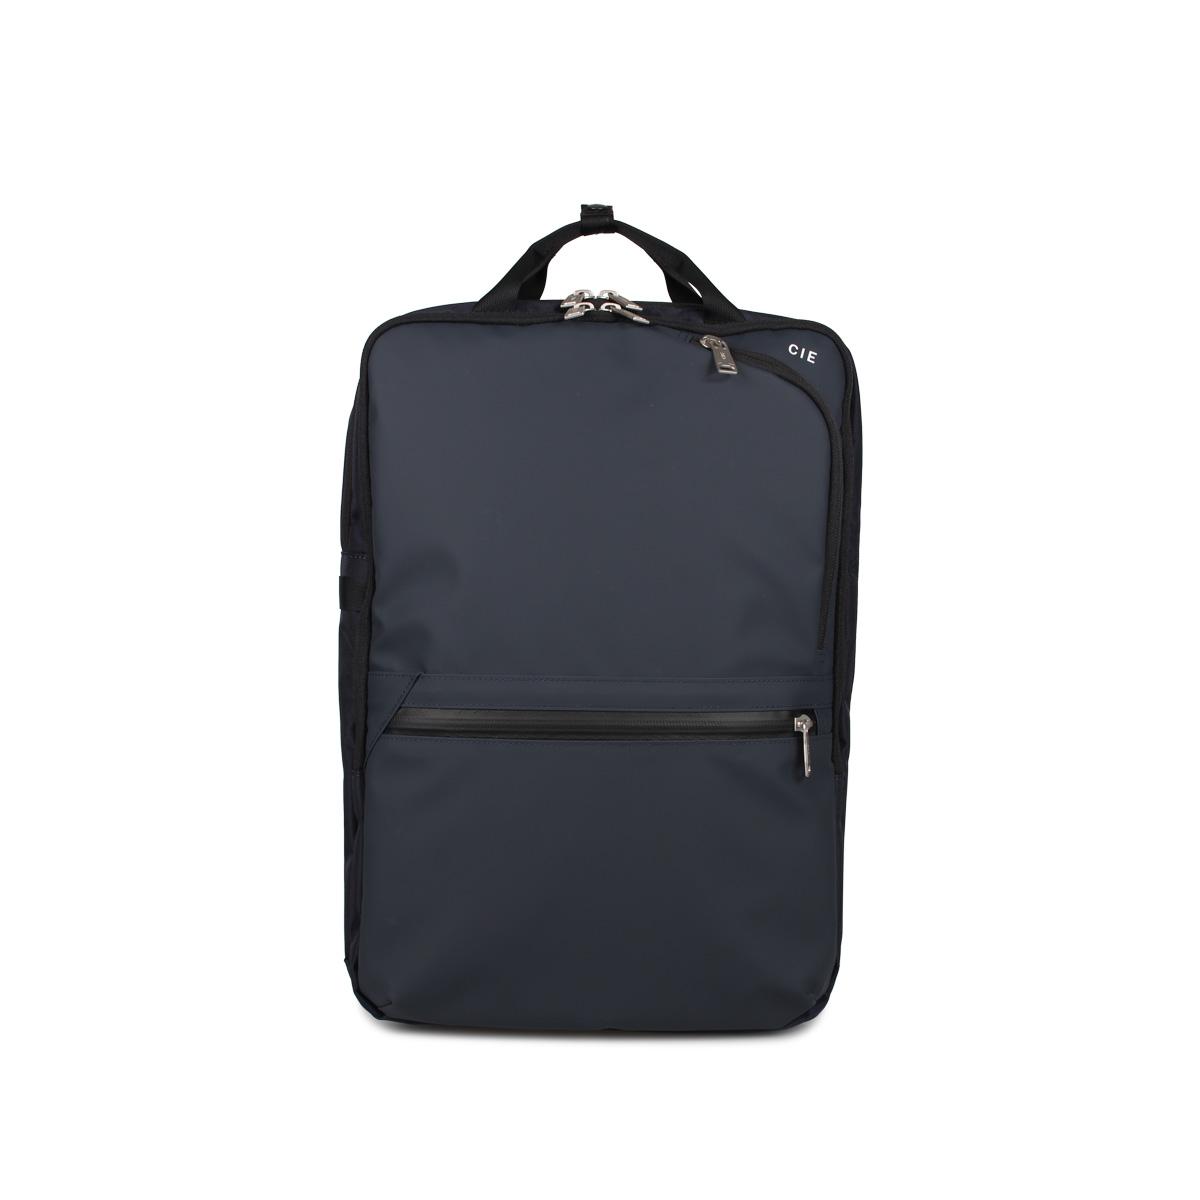 CIE VARIOUS シー リュック バッグ バックパック メンズ レディース ブラック グレー ネイビー 黒 021804 [4/30 新入荷]